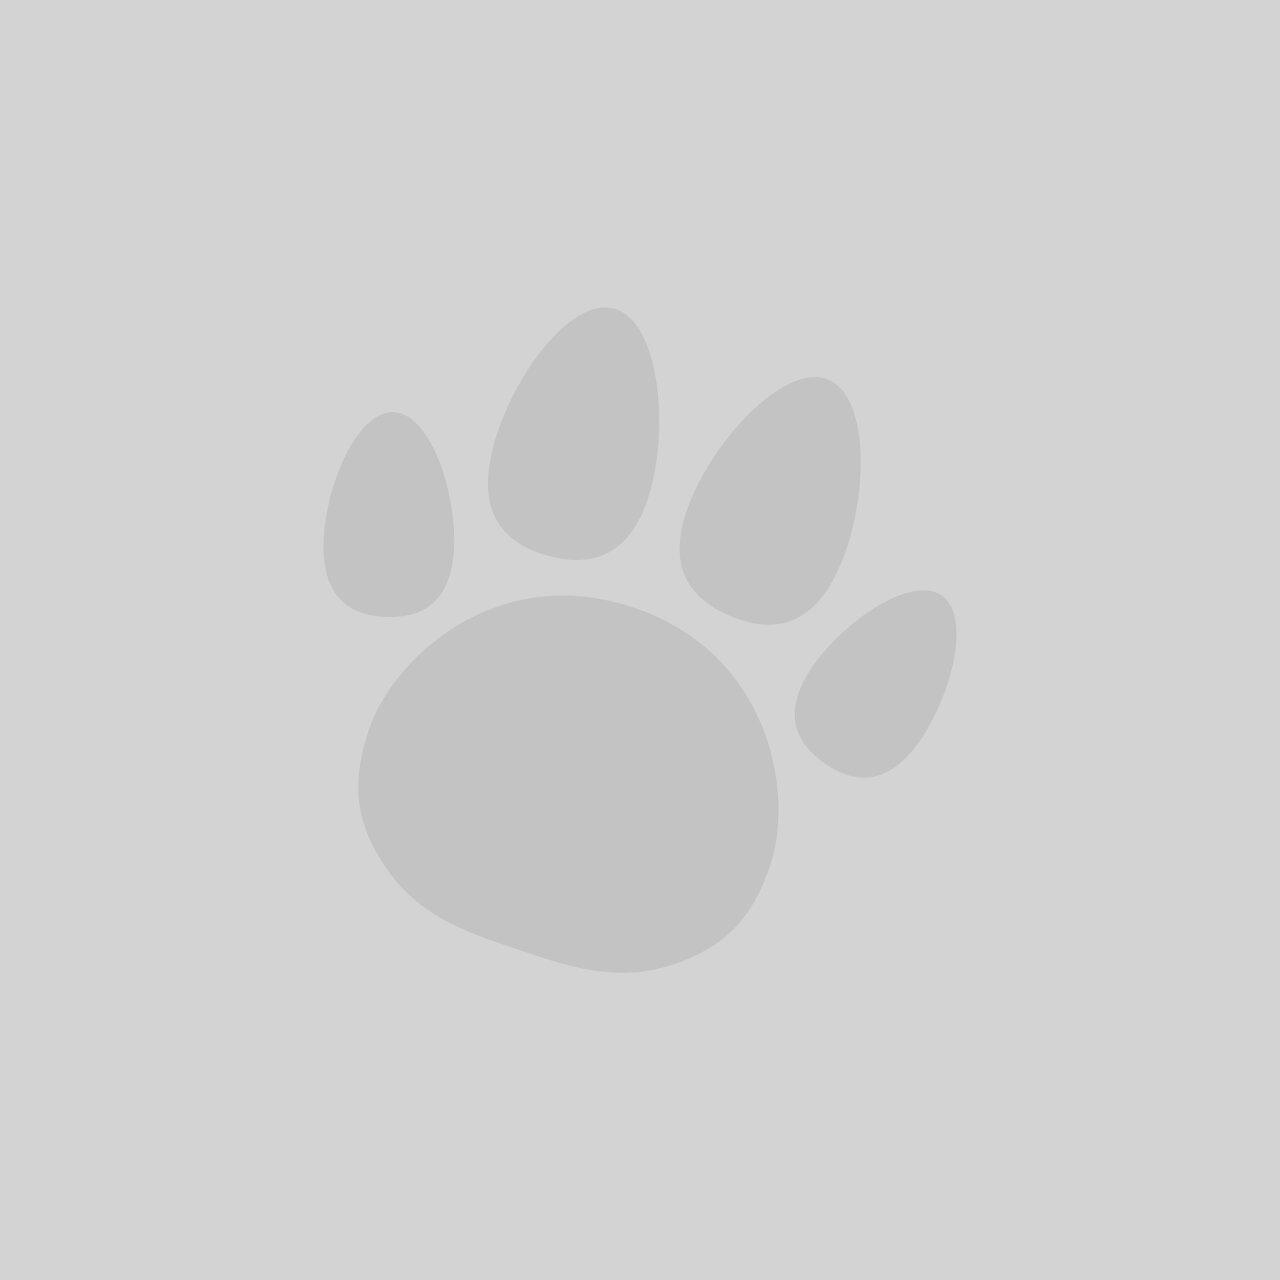 Felix Kitten As Good As It Looks Mixed Selection Multipack 12x100g